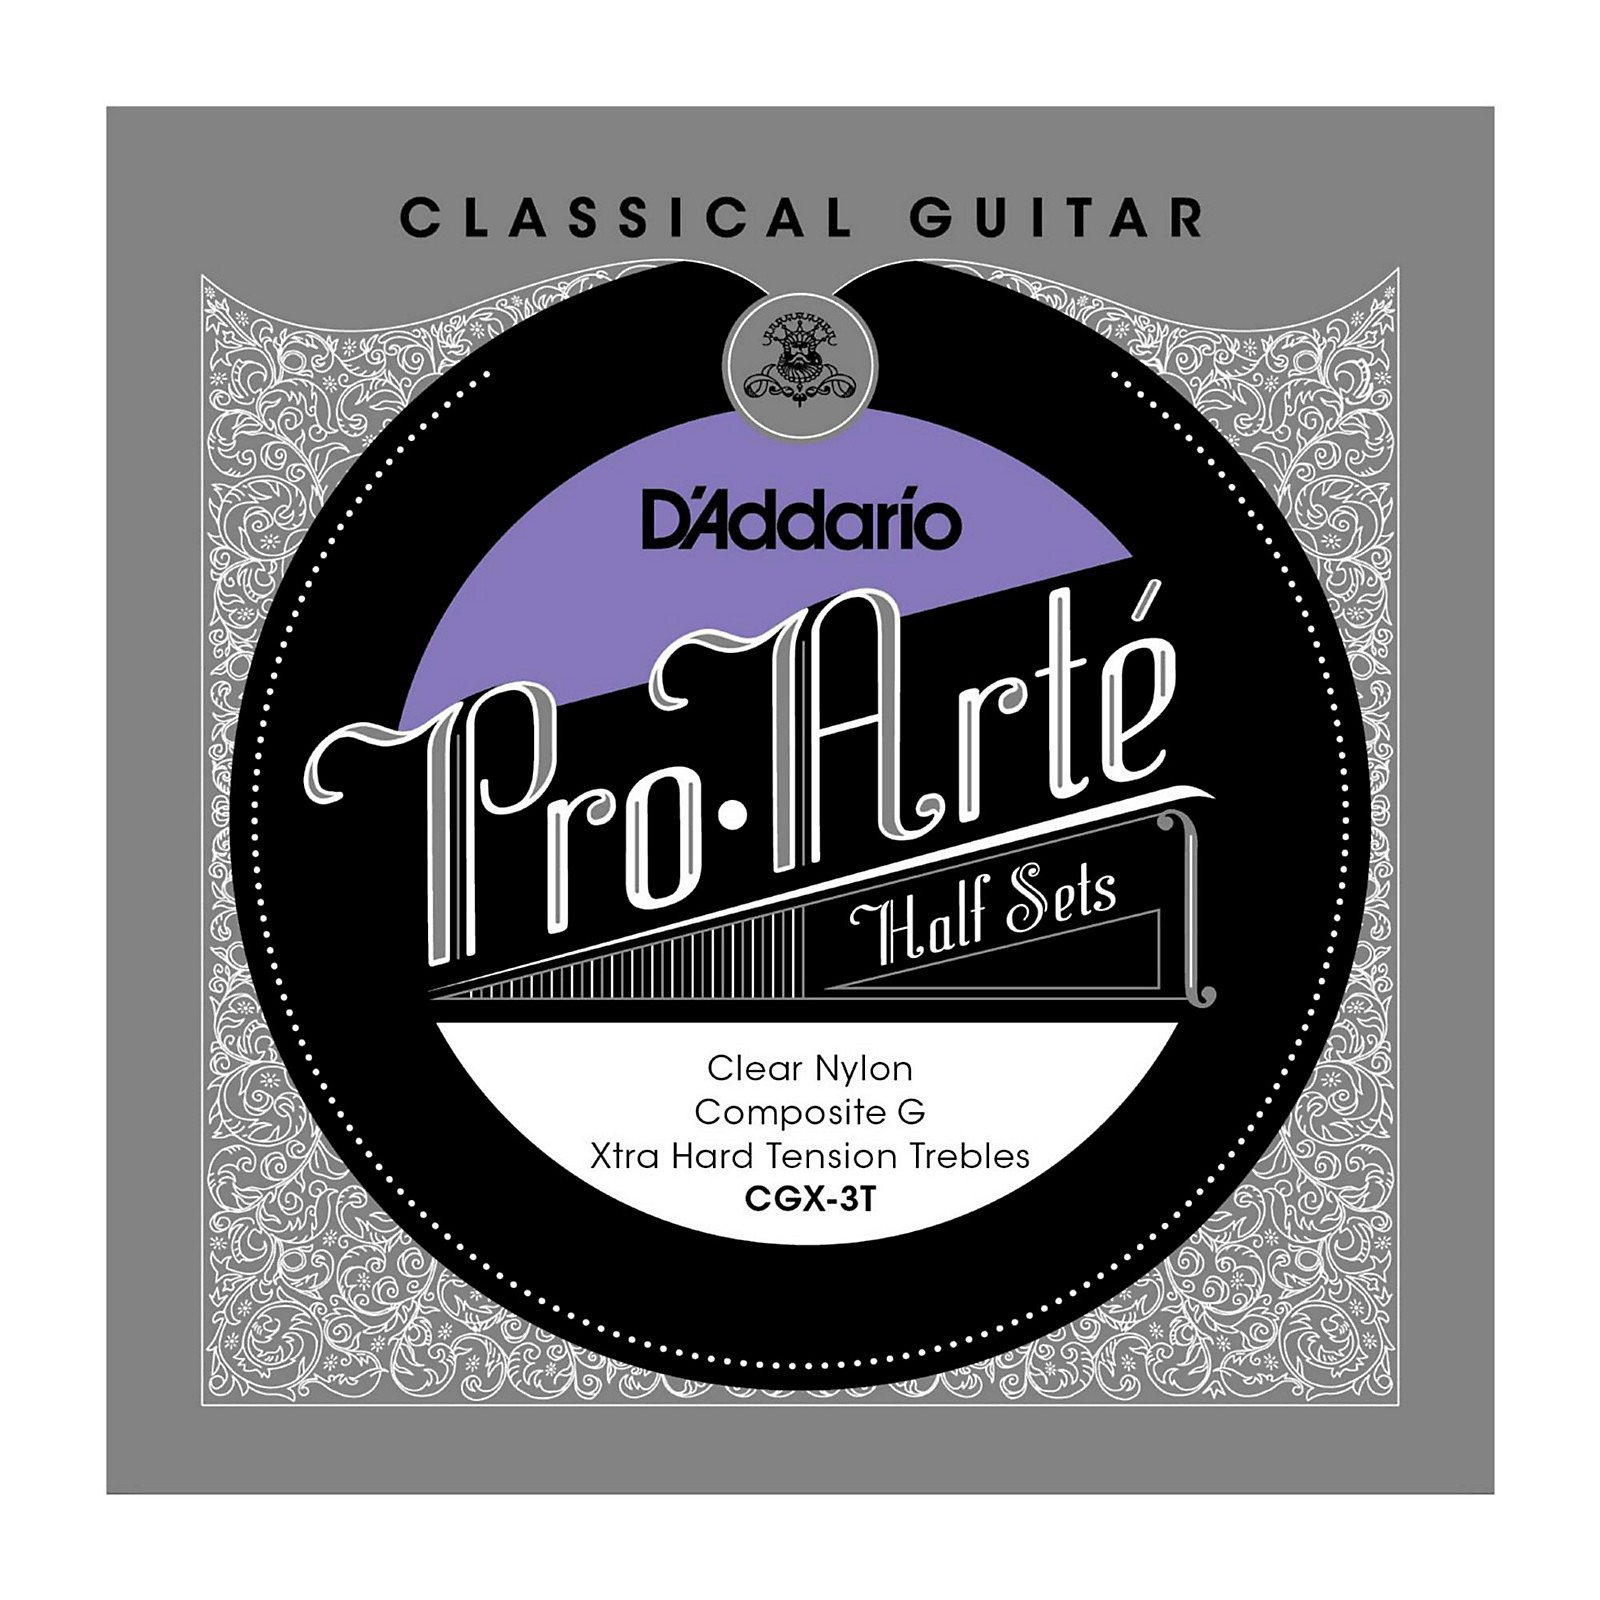 D'Addario CGX-3T Pro-Arte Extra Hard Tension G Classical Guitar Strings Half Set